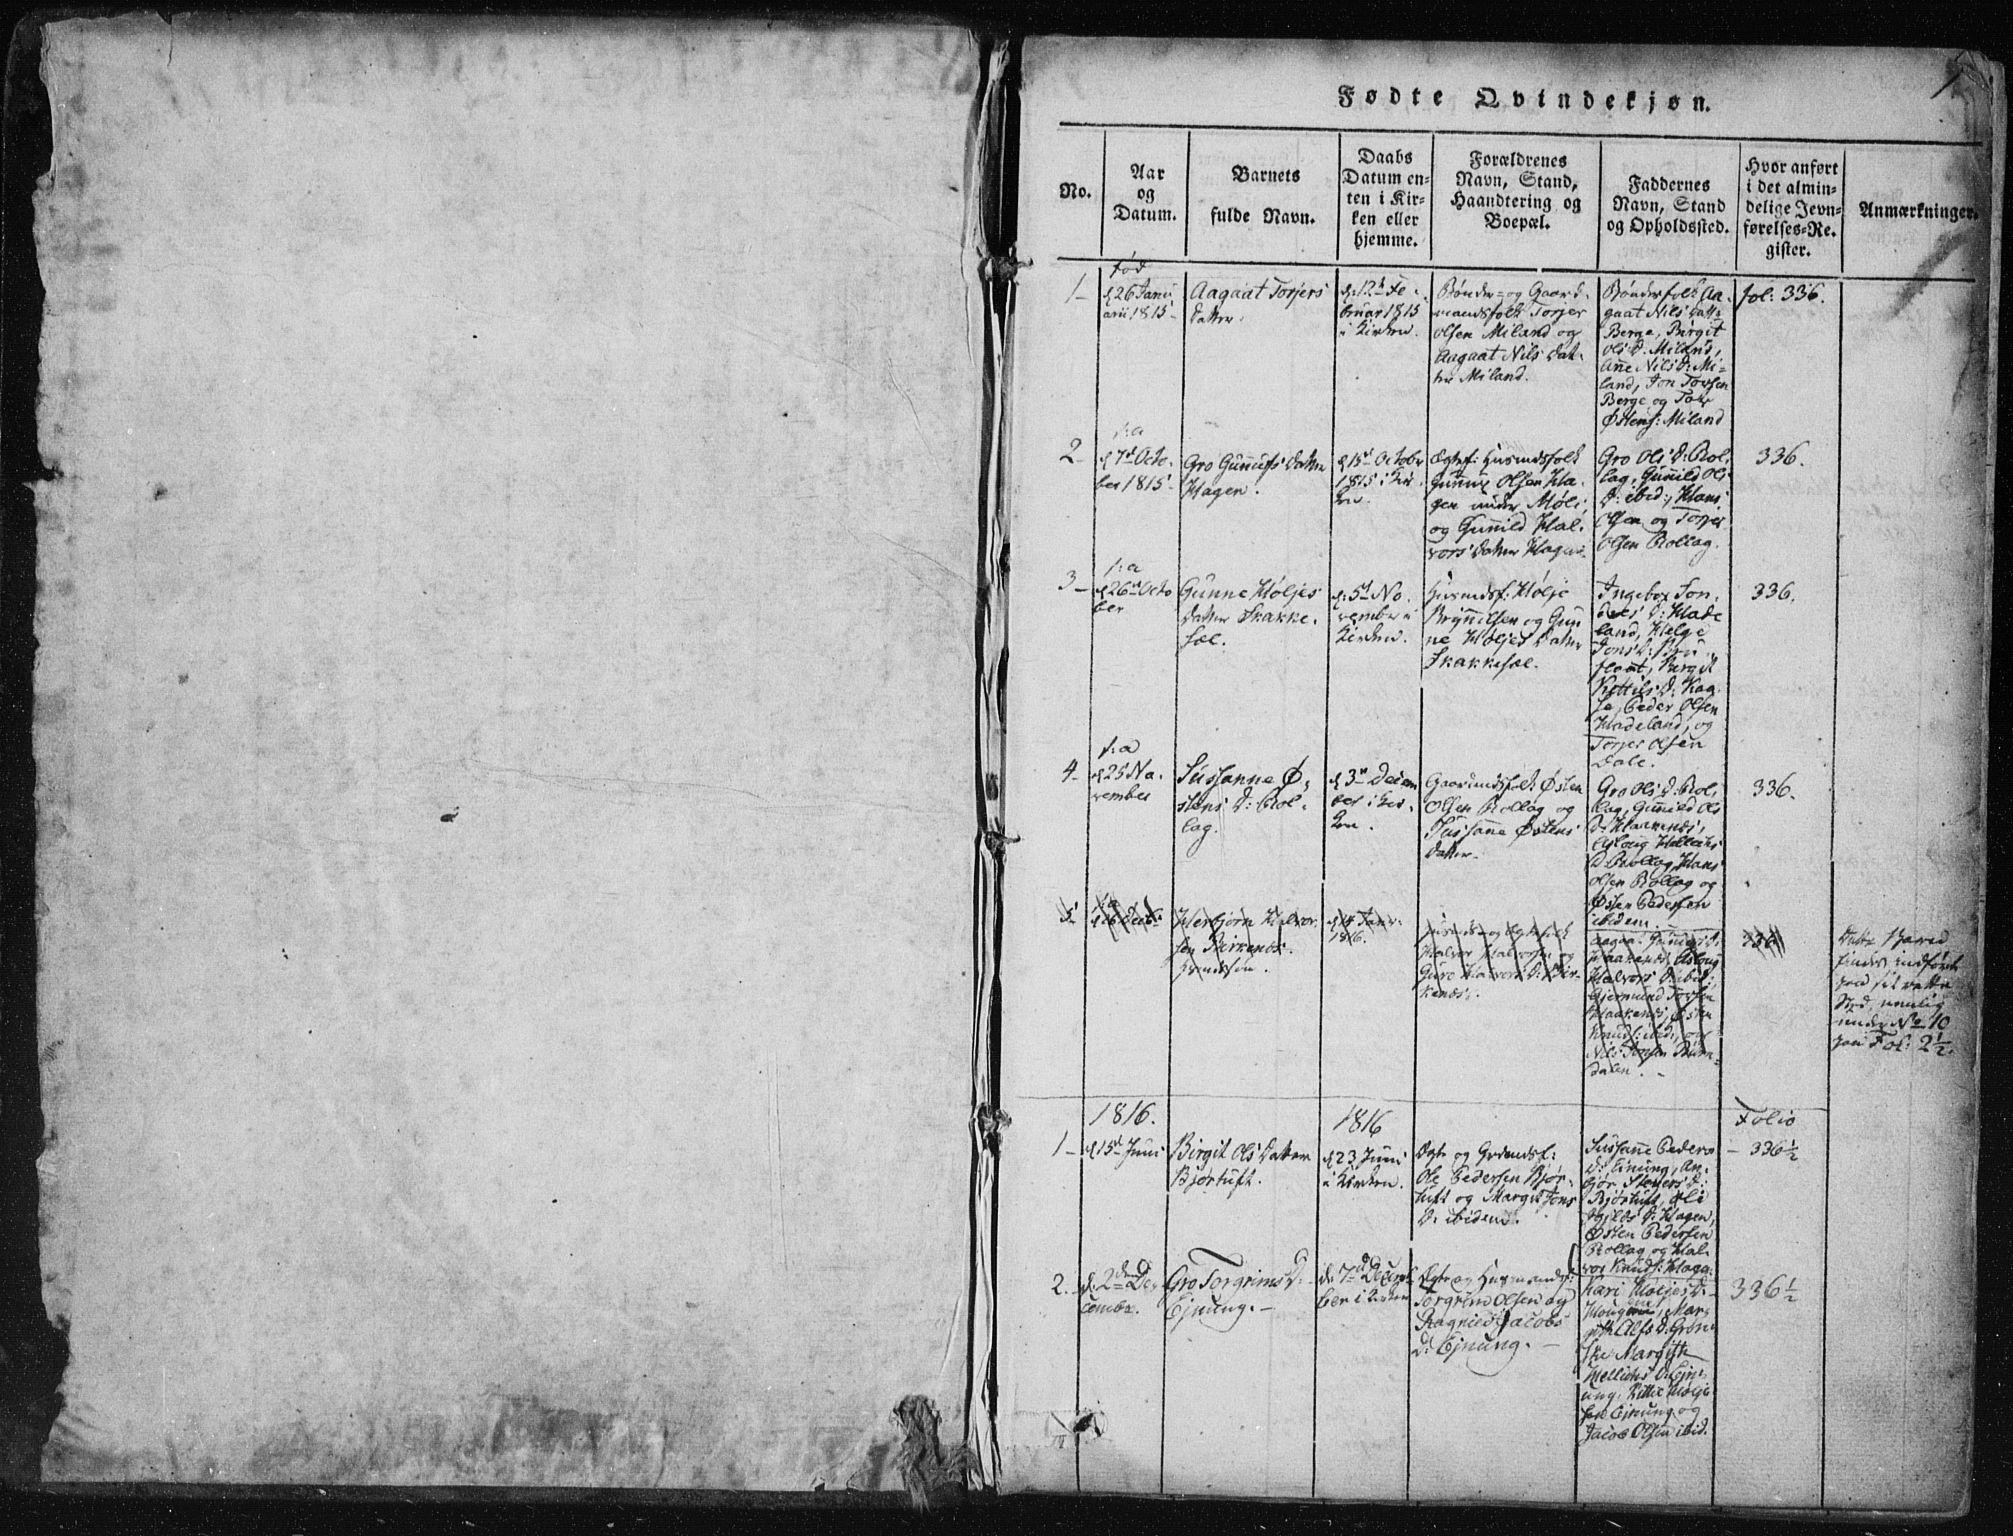 SAKO, Tinn kirkebøker, F/Fb/L0001: Ministerialbok nr. II 1, 1815-1843, s. 1